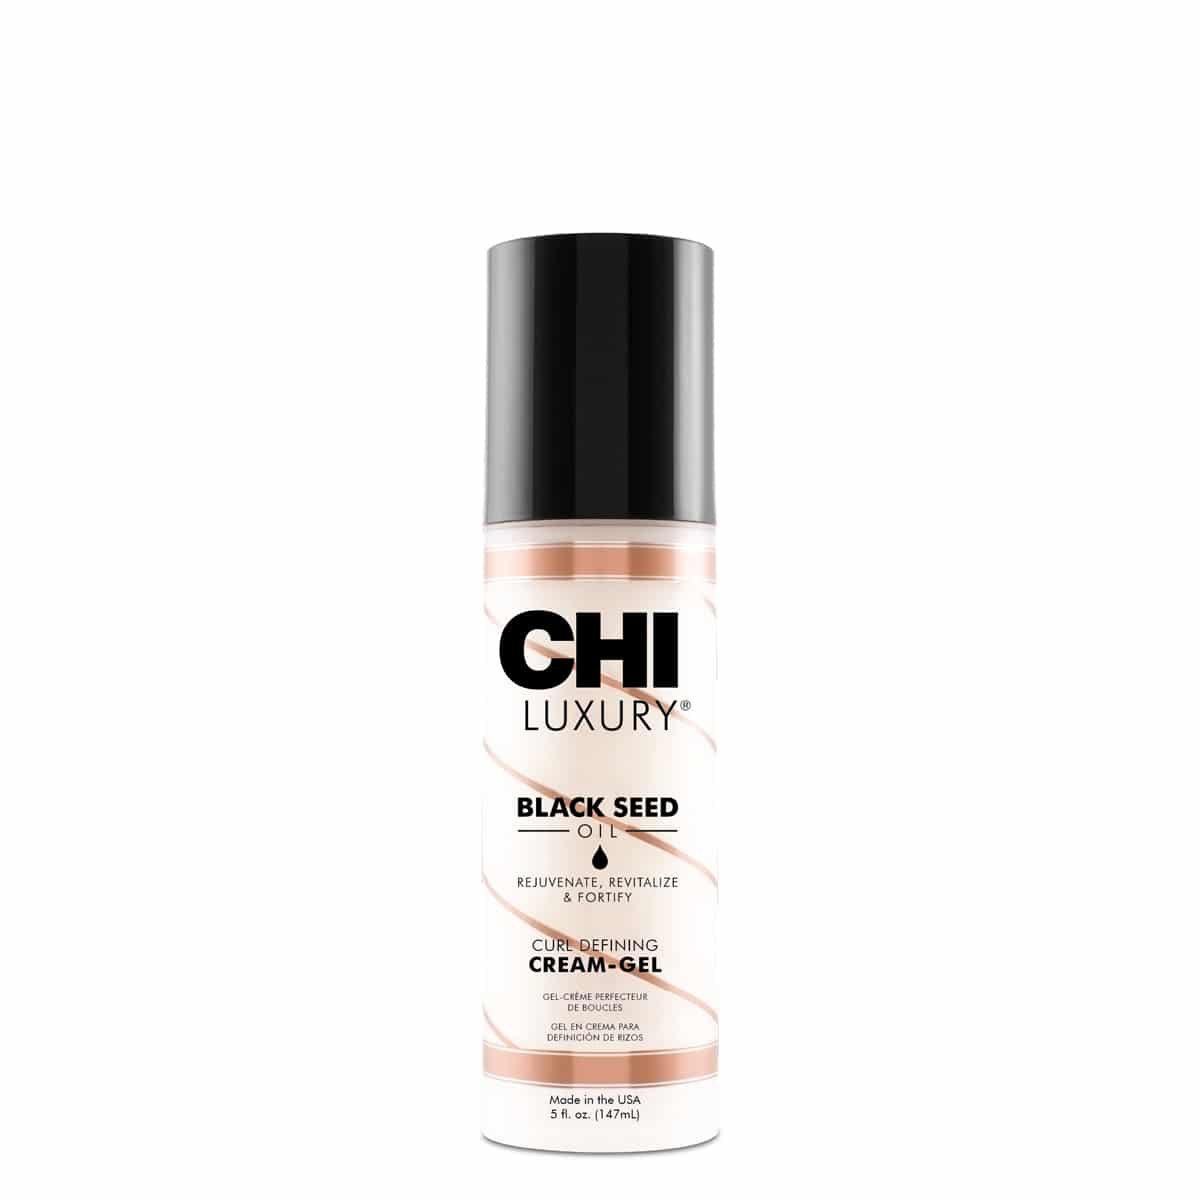 CHI Luxury Black Seed Oil Curl Defining Cream Gel - tužící tvarovací krémový gel na kudrnaté vlasy, 148 ml